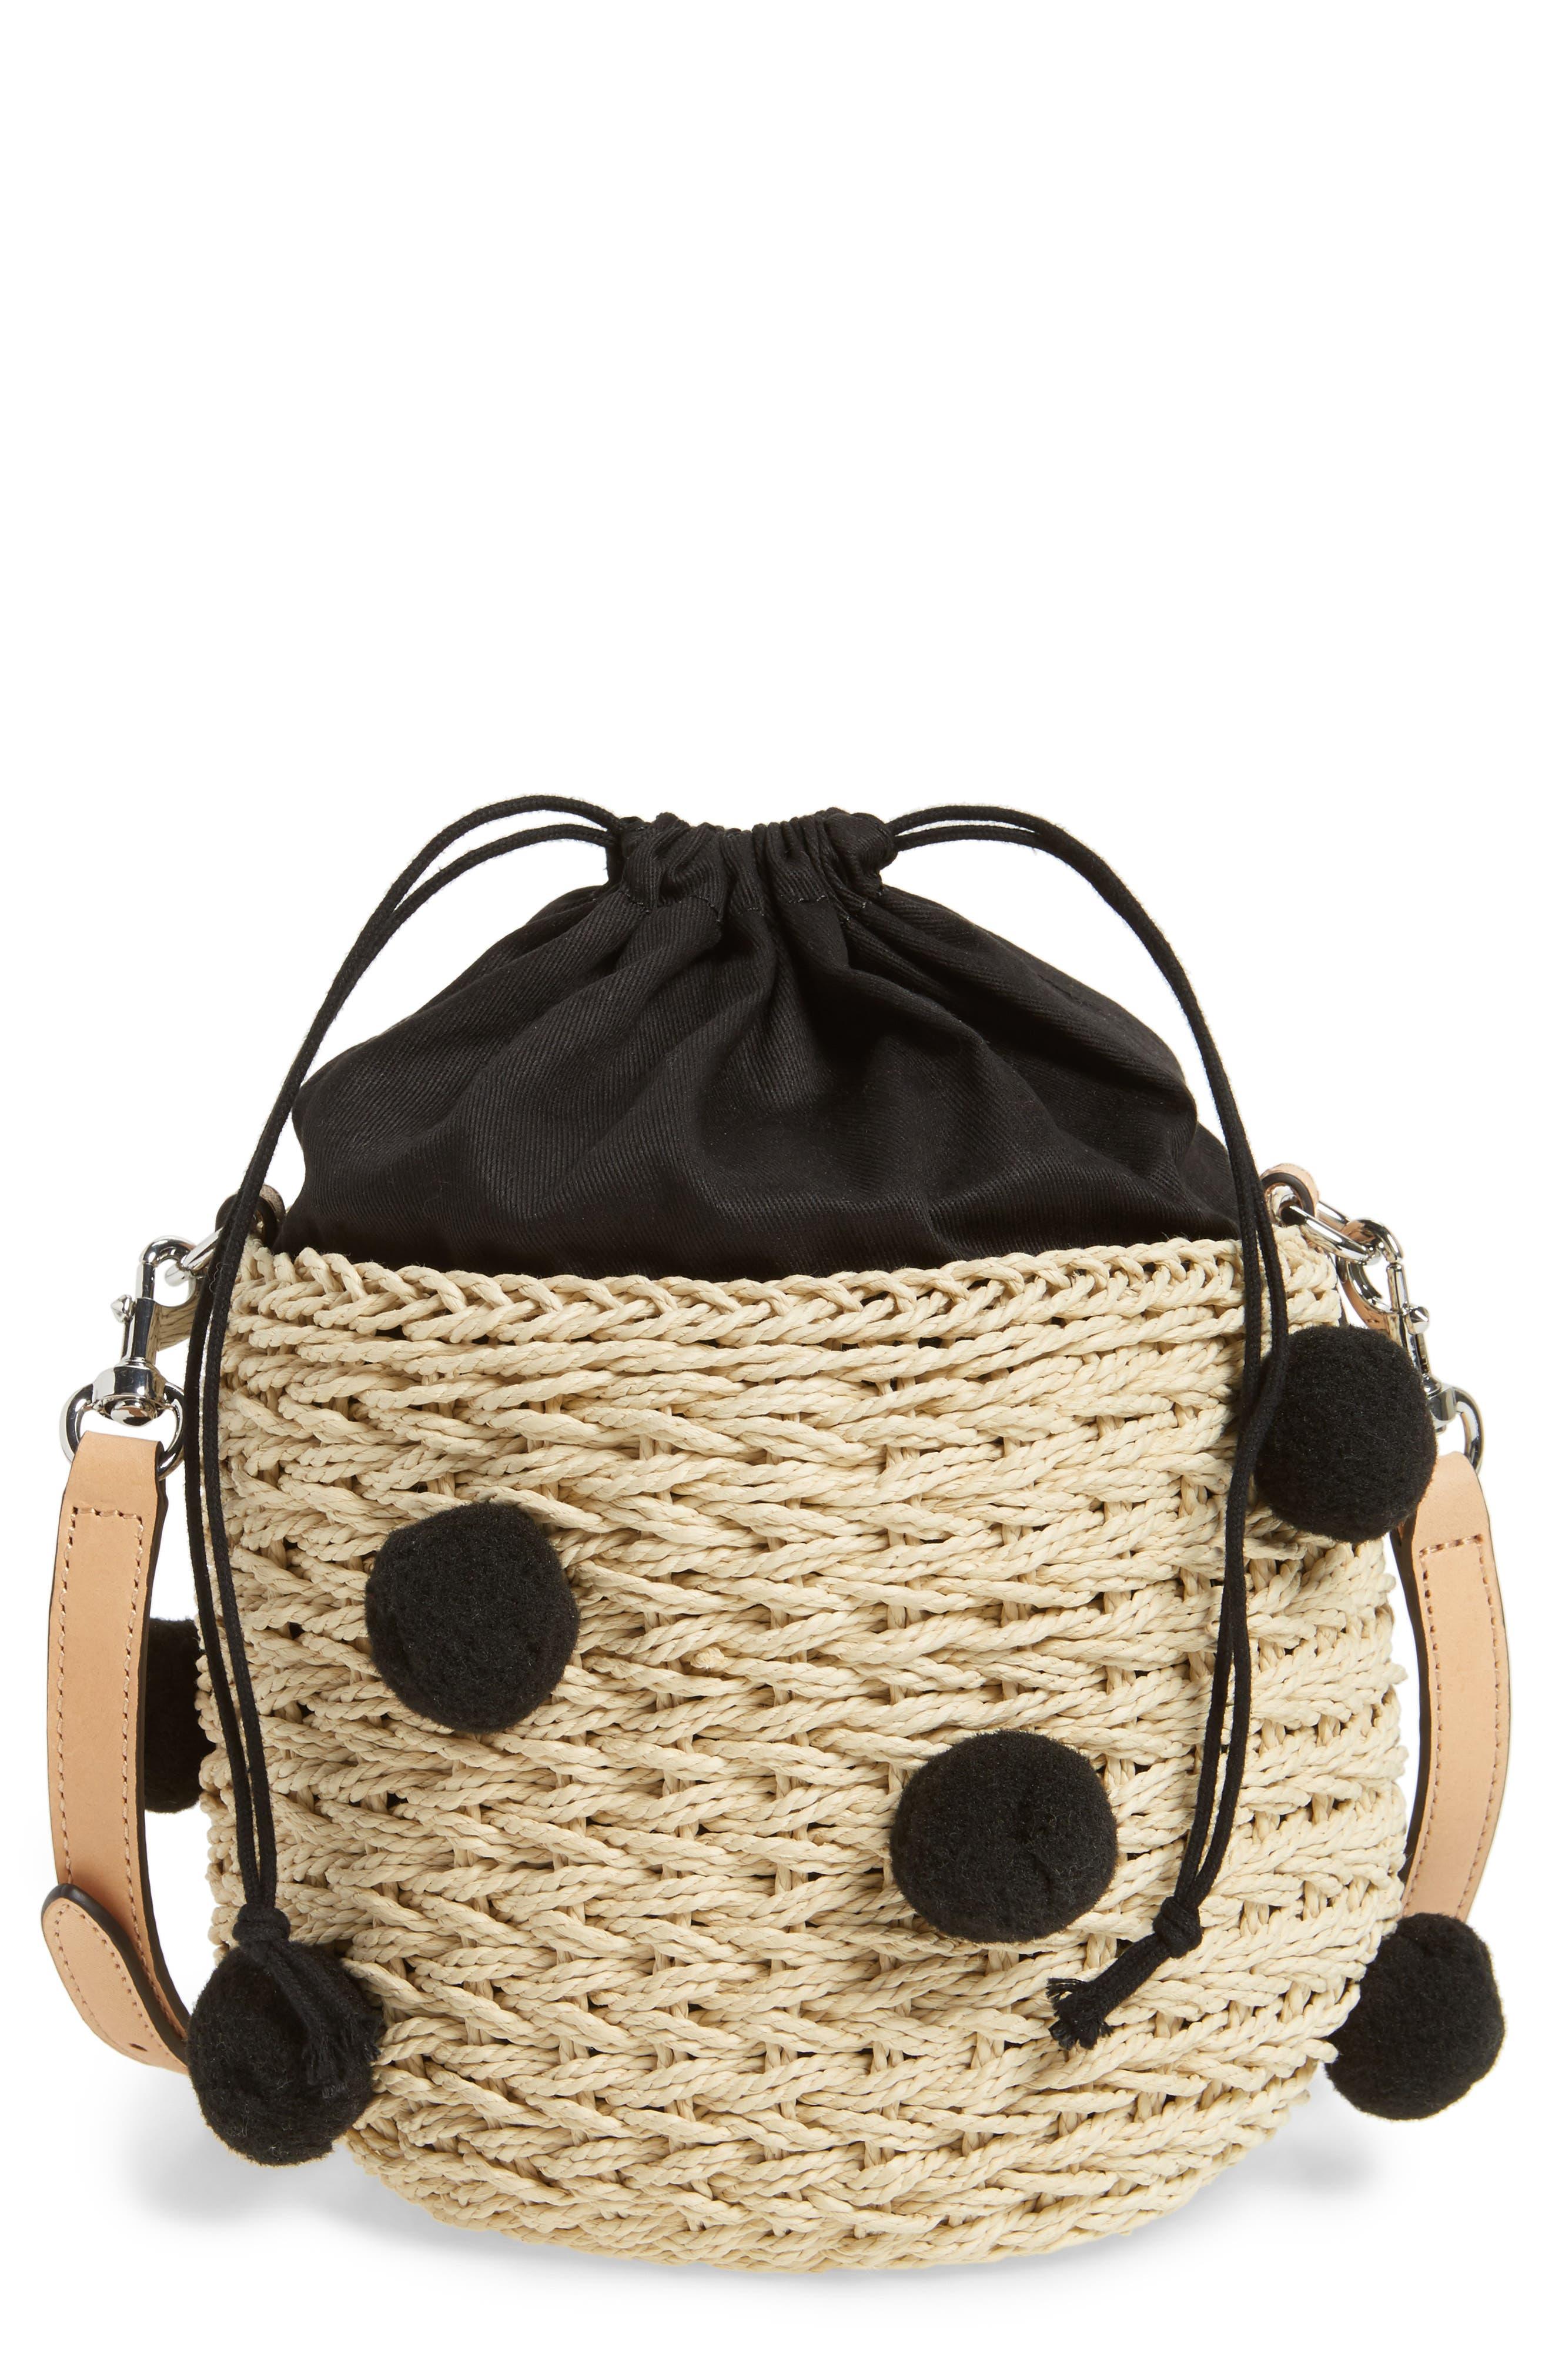 Main Image - Rebecca Minkoff Straw Pom Pom Bucket Bag